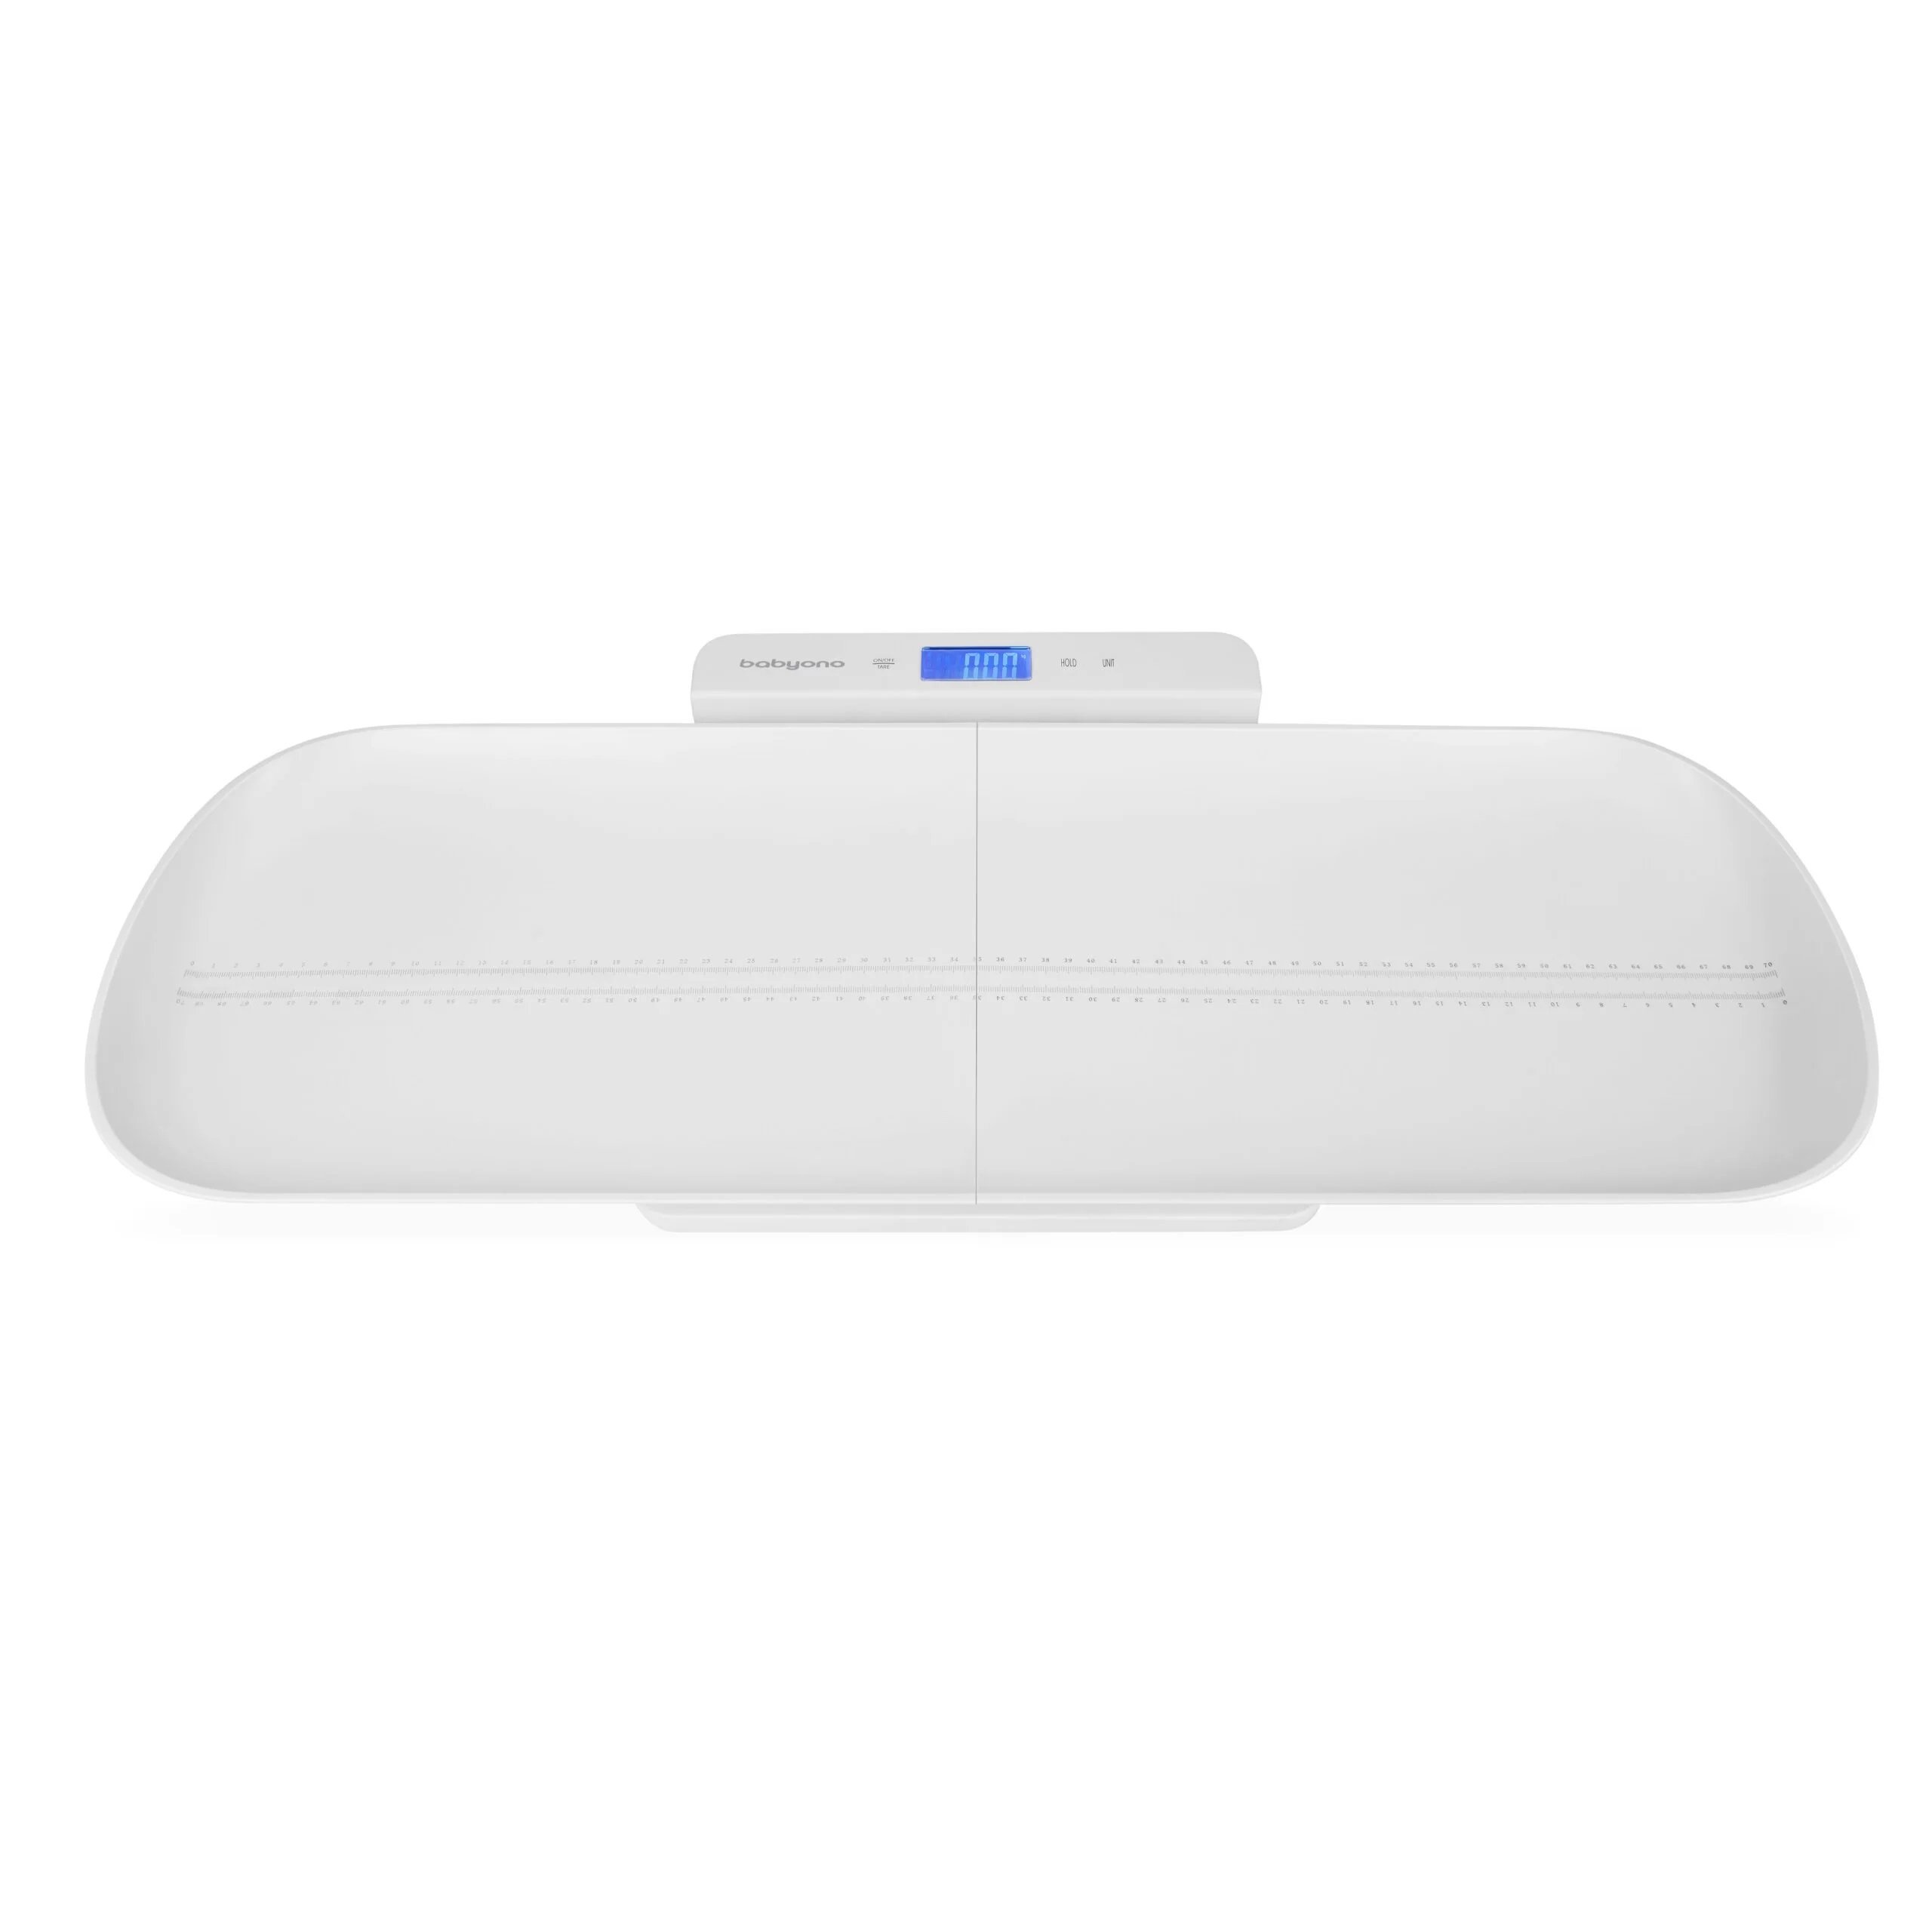 Kojeneck� elektronick� v�ha SMART 2v1 s Bluetooth - zv��i� obr�zok